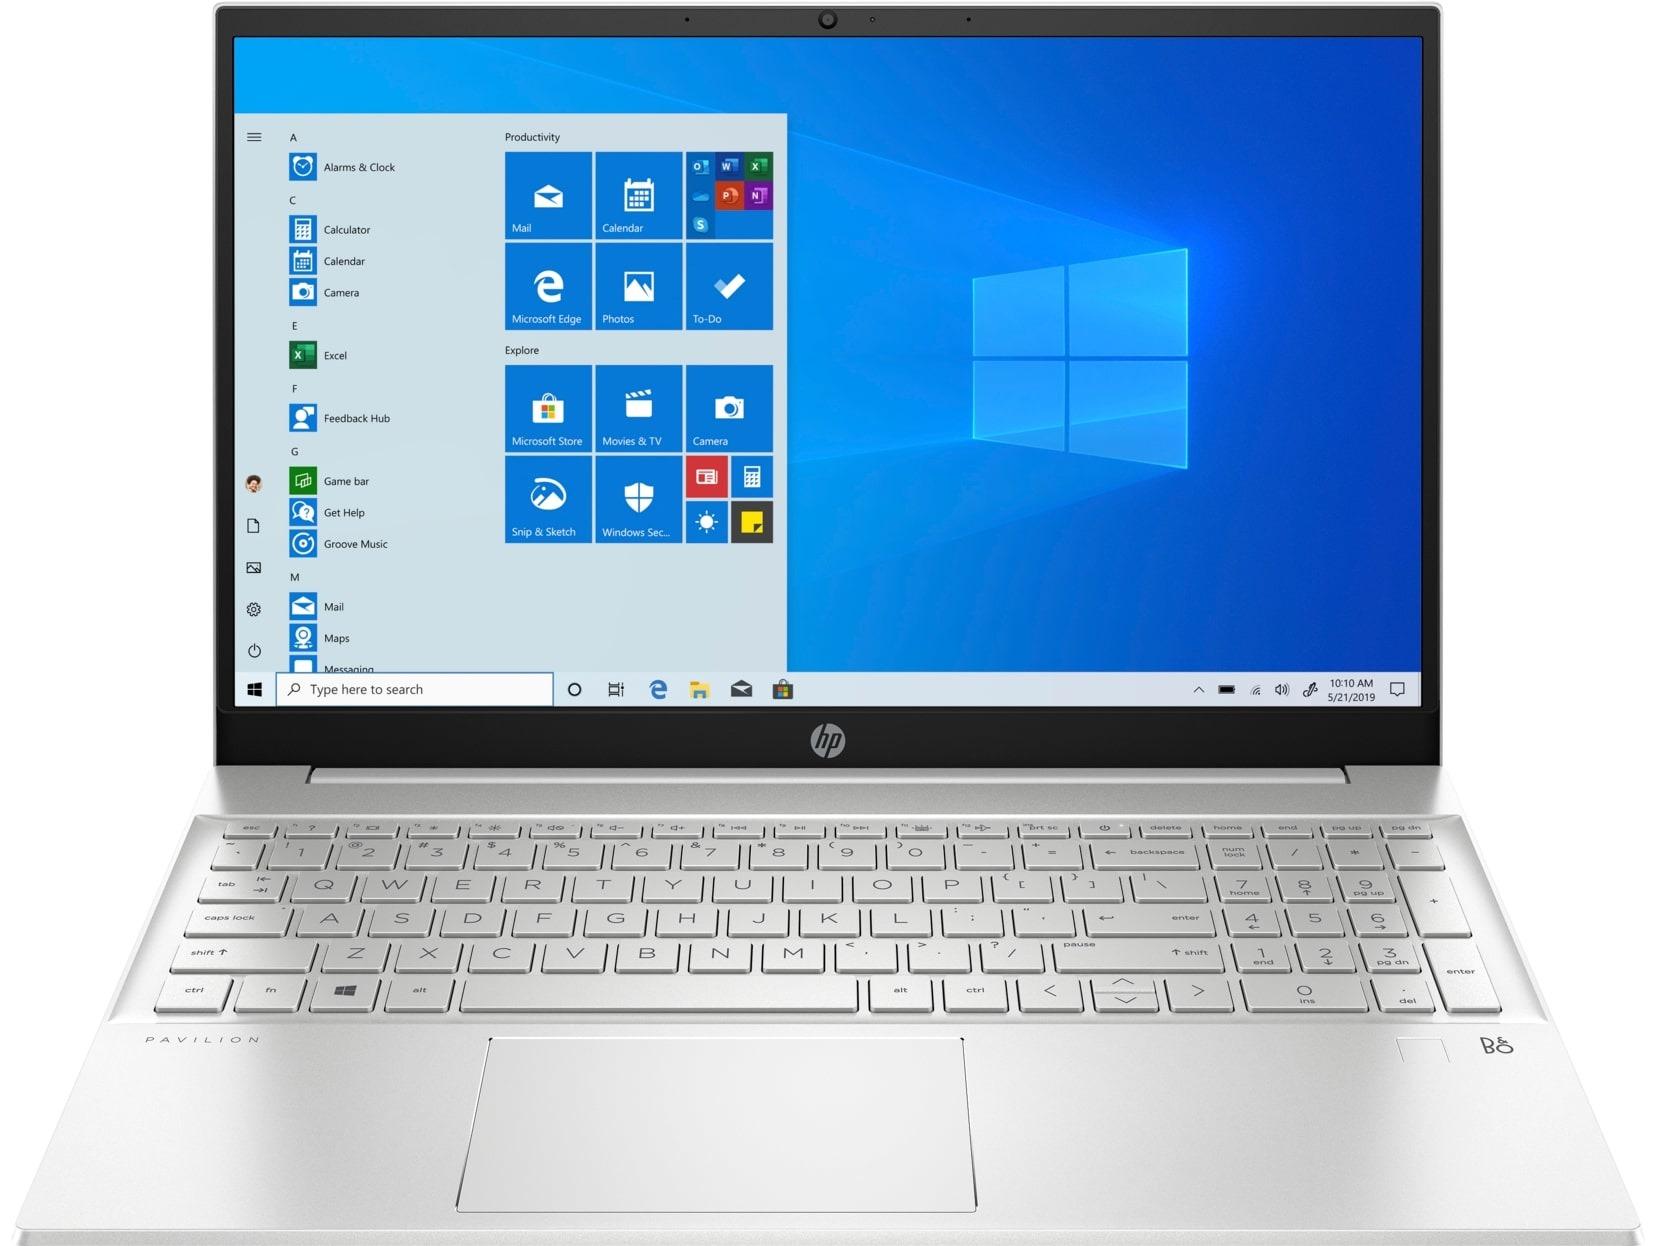 HP Pavilion 15-eh1222nd - 16 GB RAM, 512 GB SSD, 15.6 inch scherm